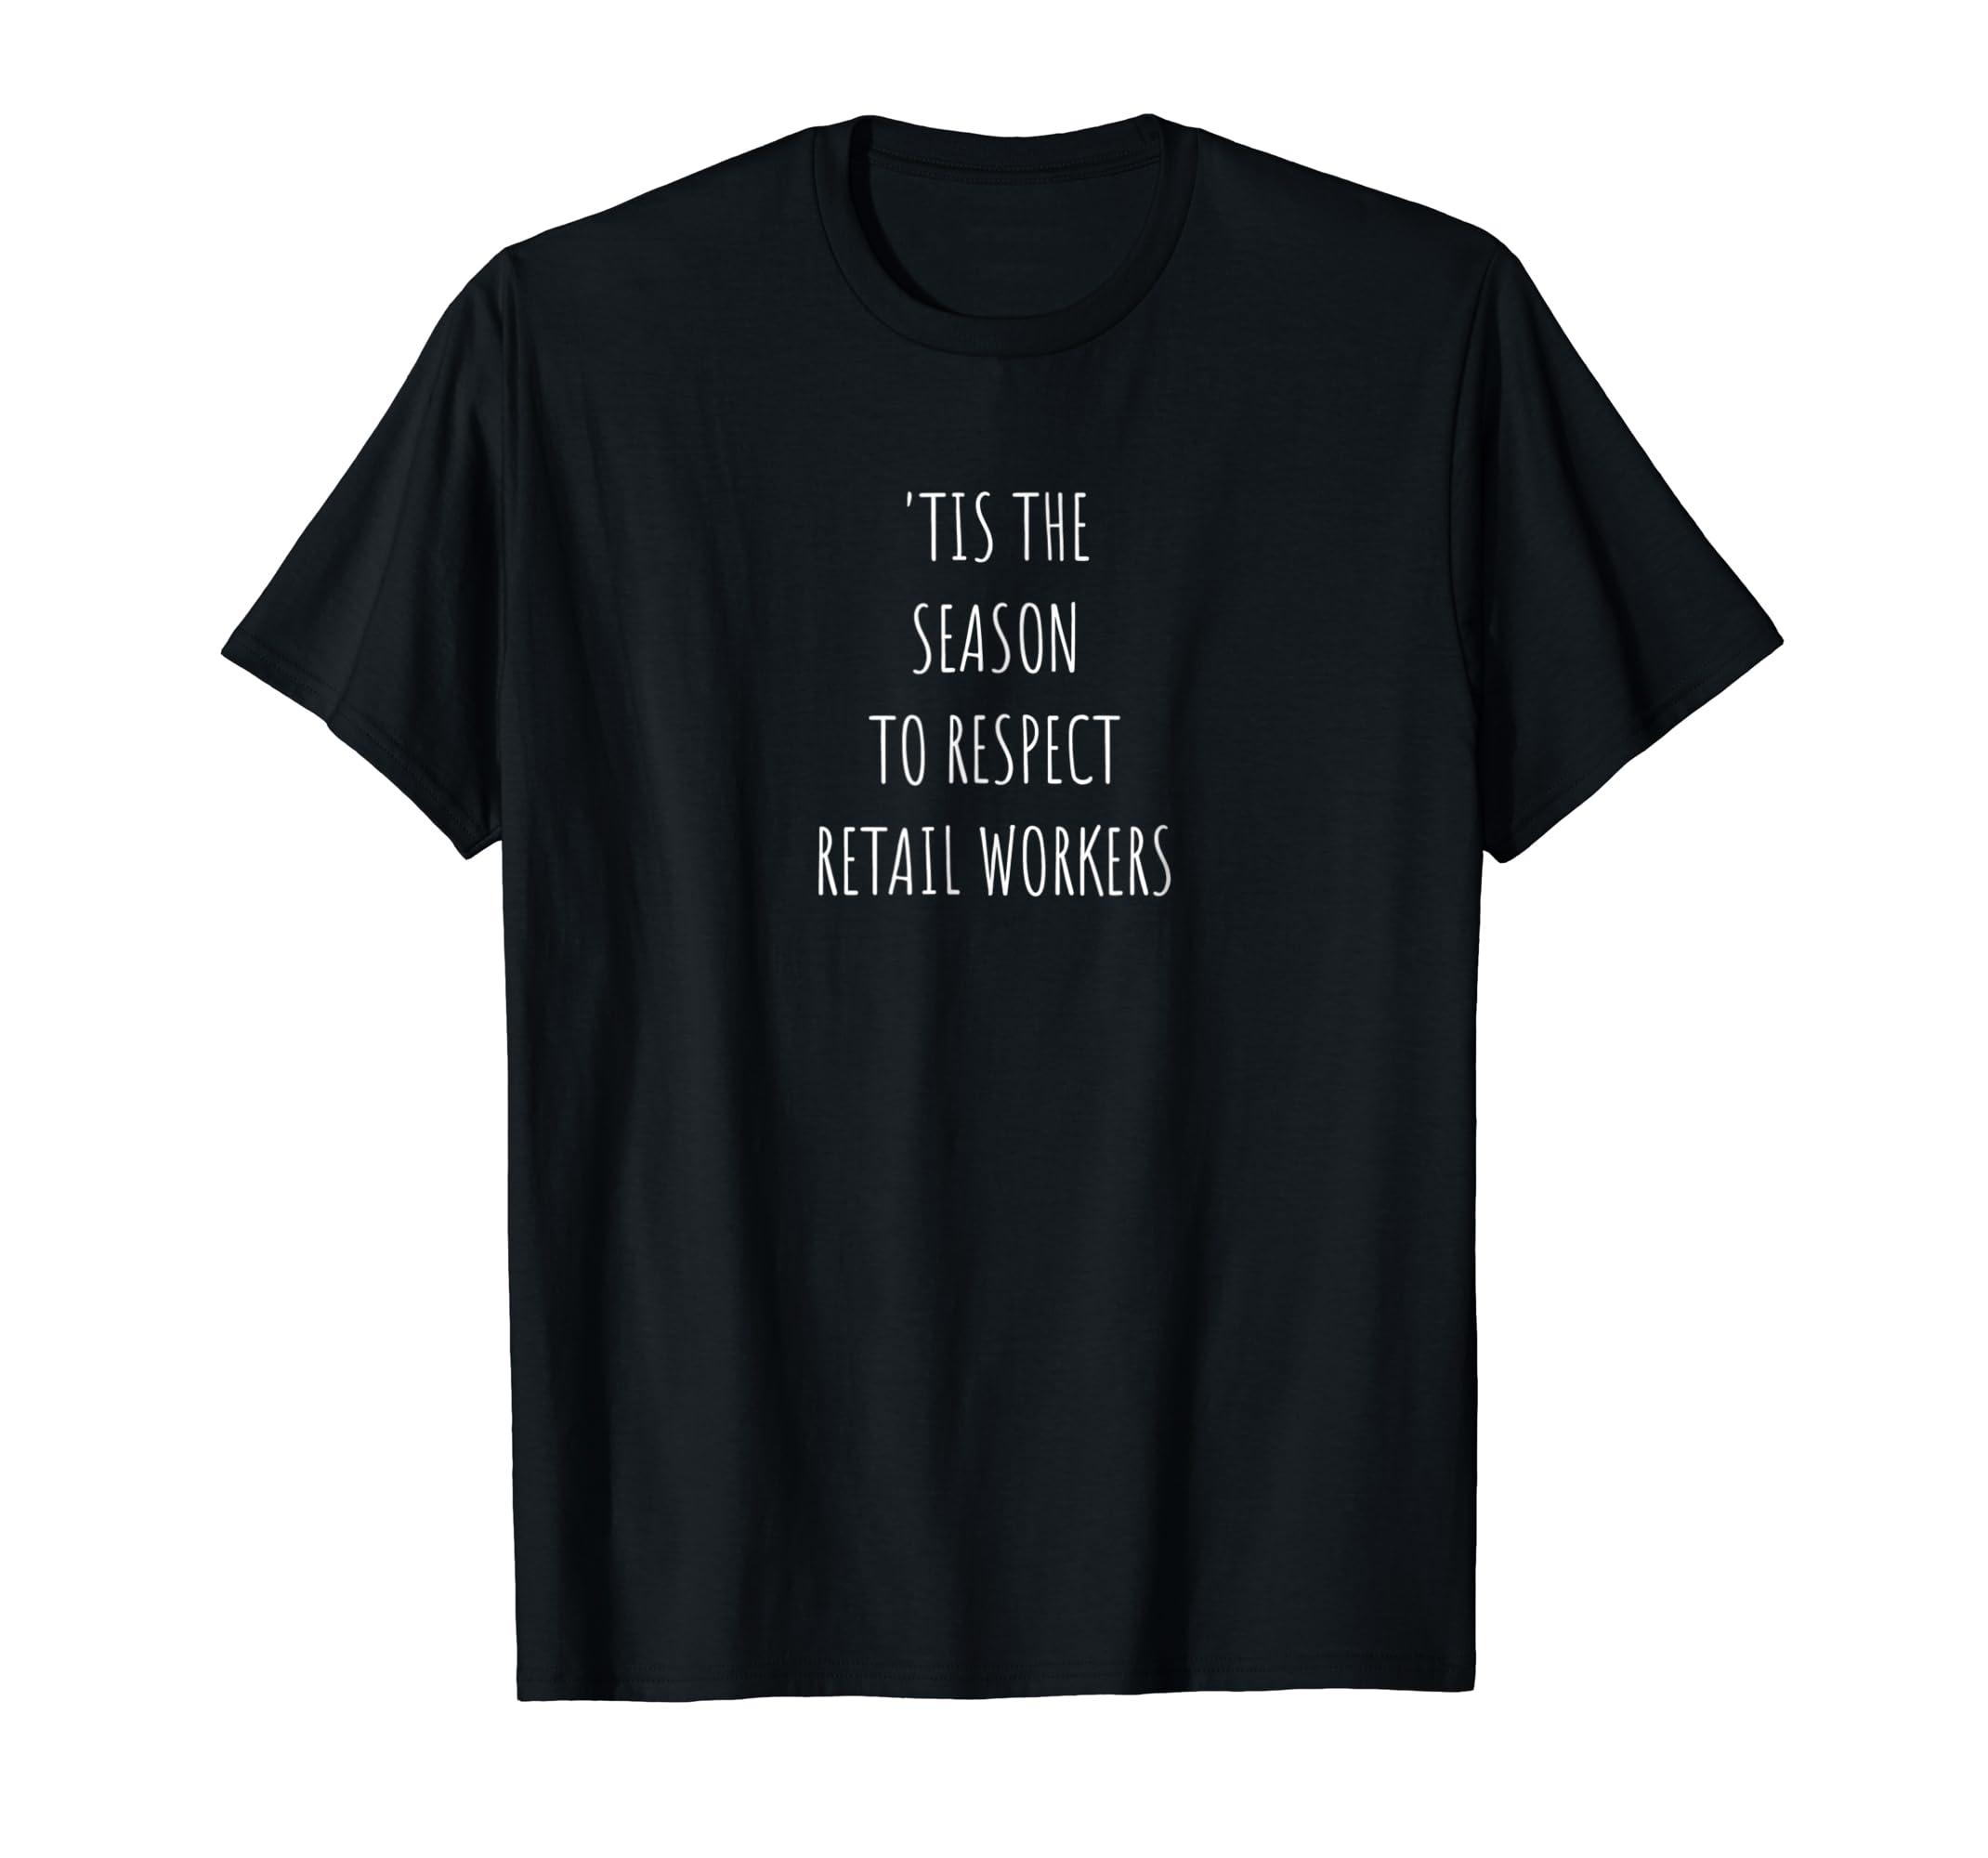 'Tis the Season To Respect Retail Workers-ln